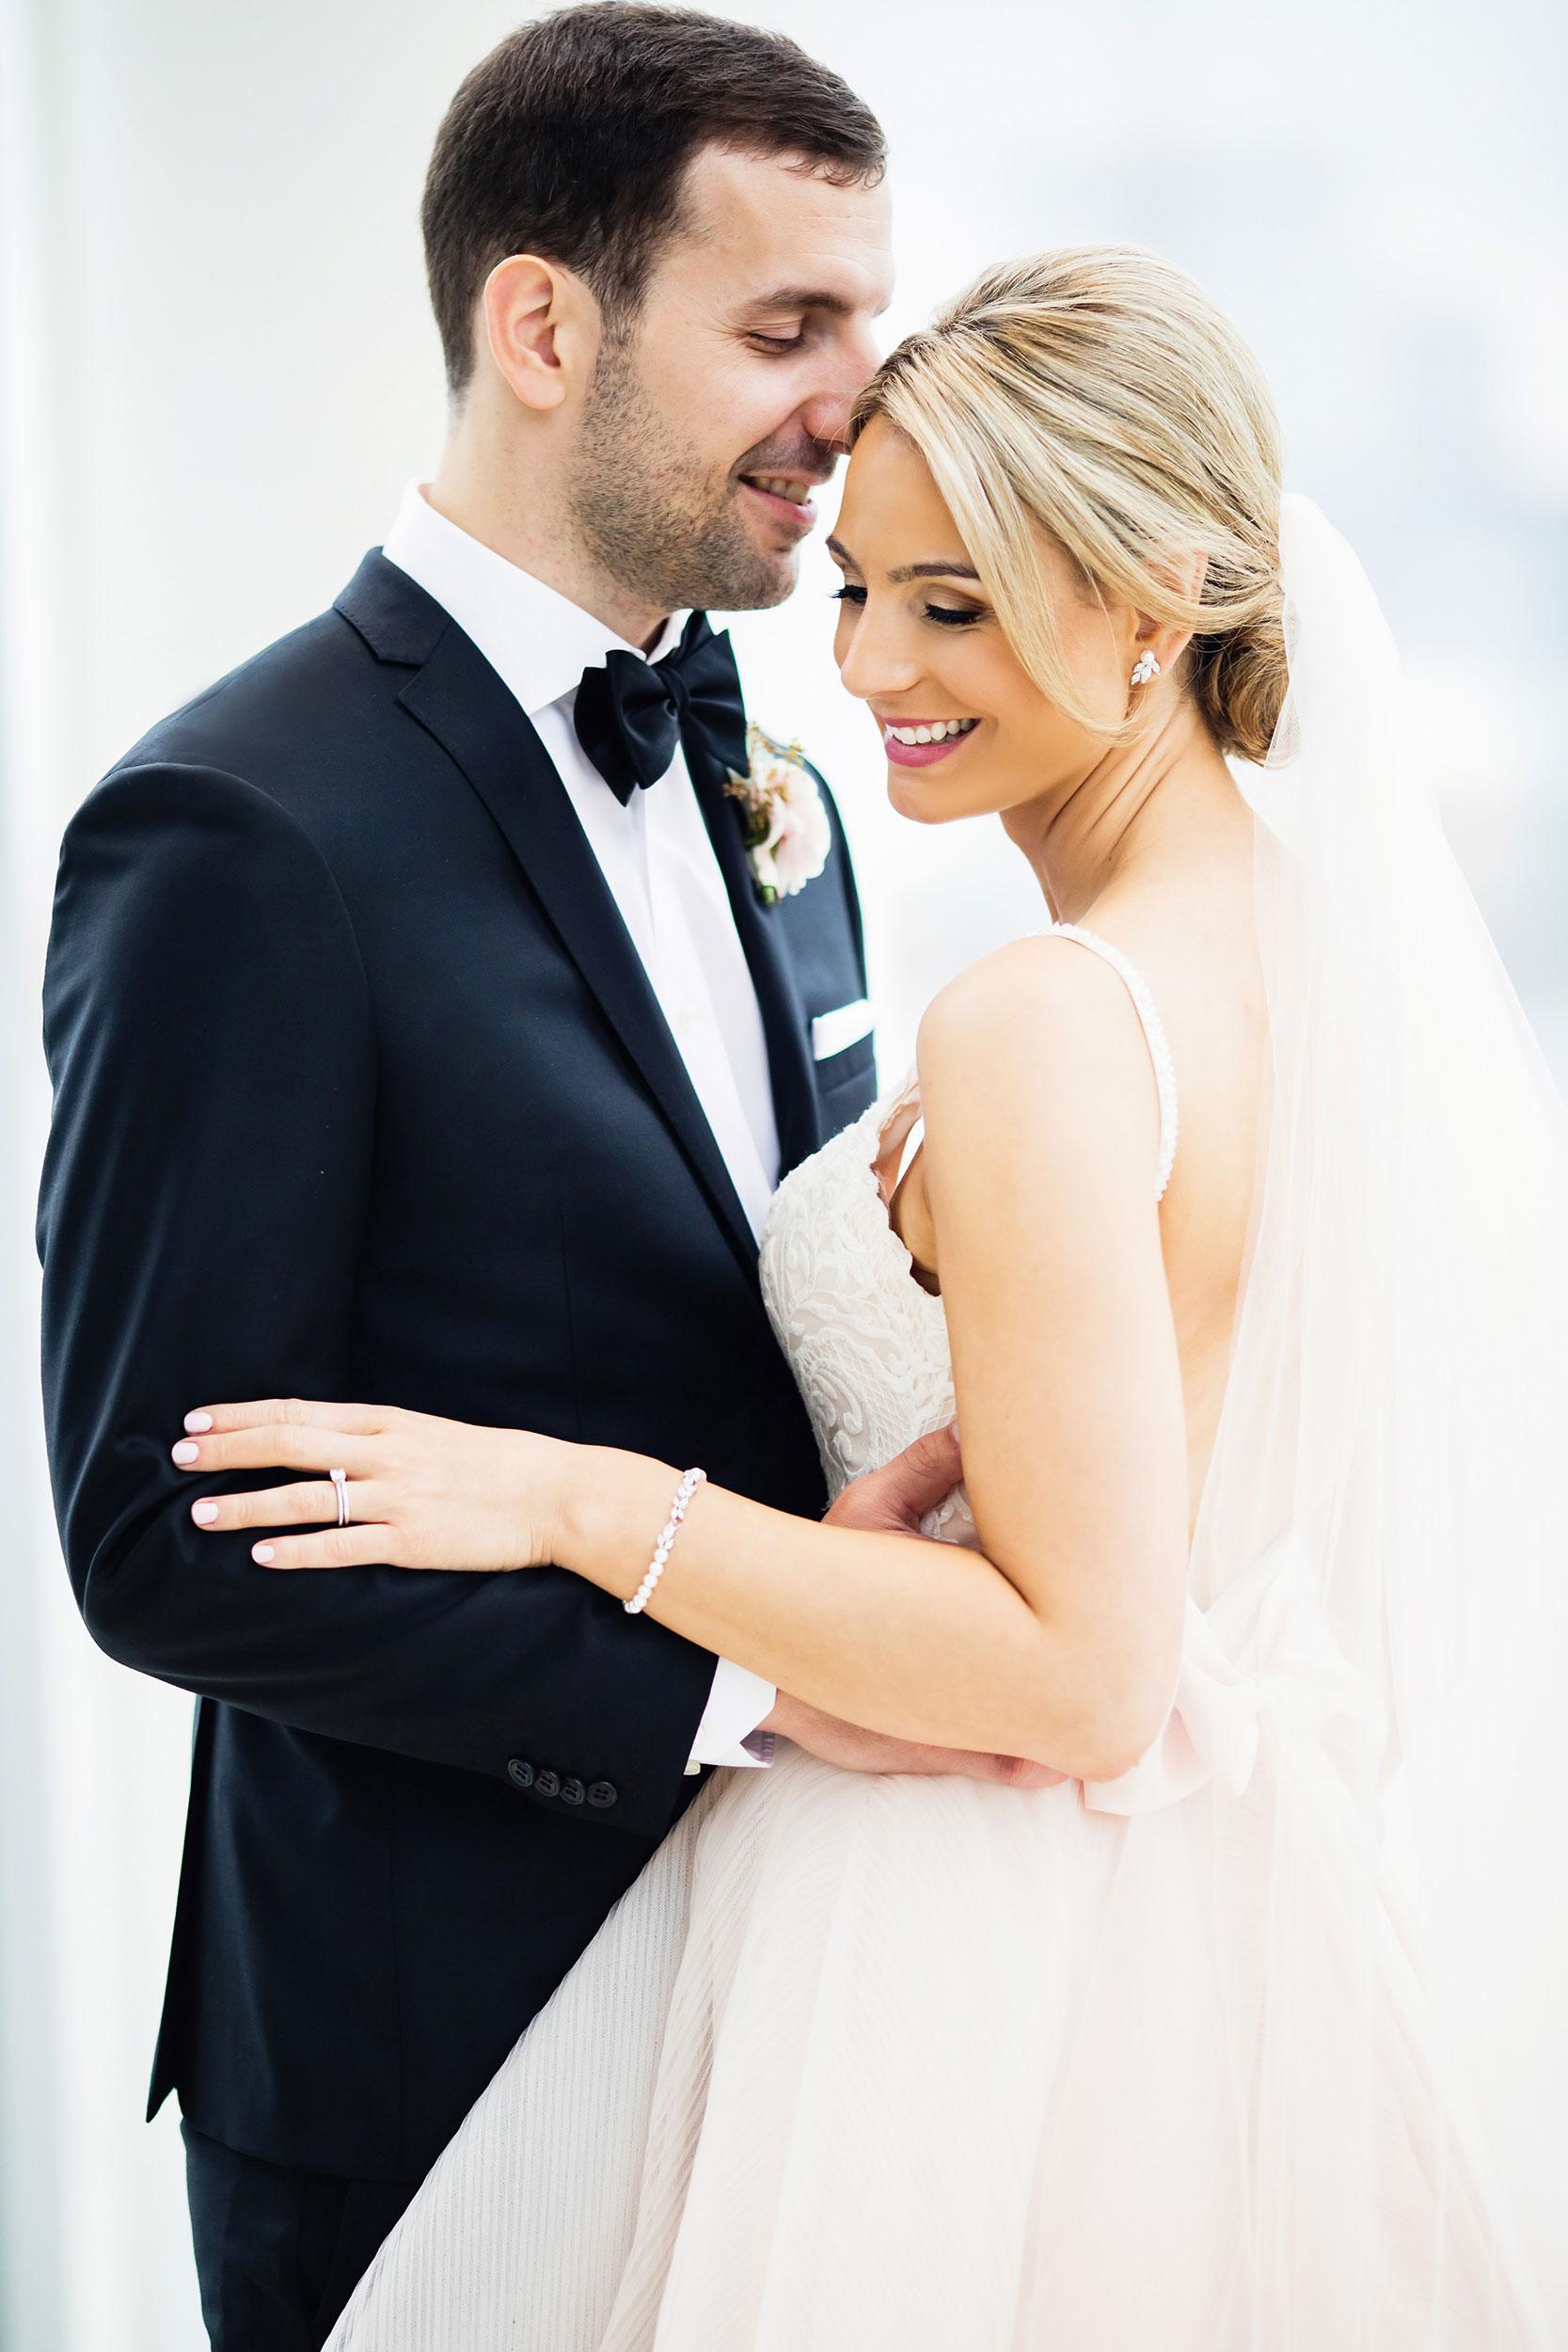 stylish-wedding-photography-windsor-toronto-ontario-wedding-photographer-winery-eryn-shea-photography-34.JPG